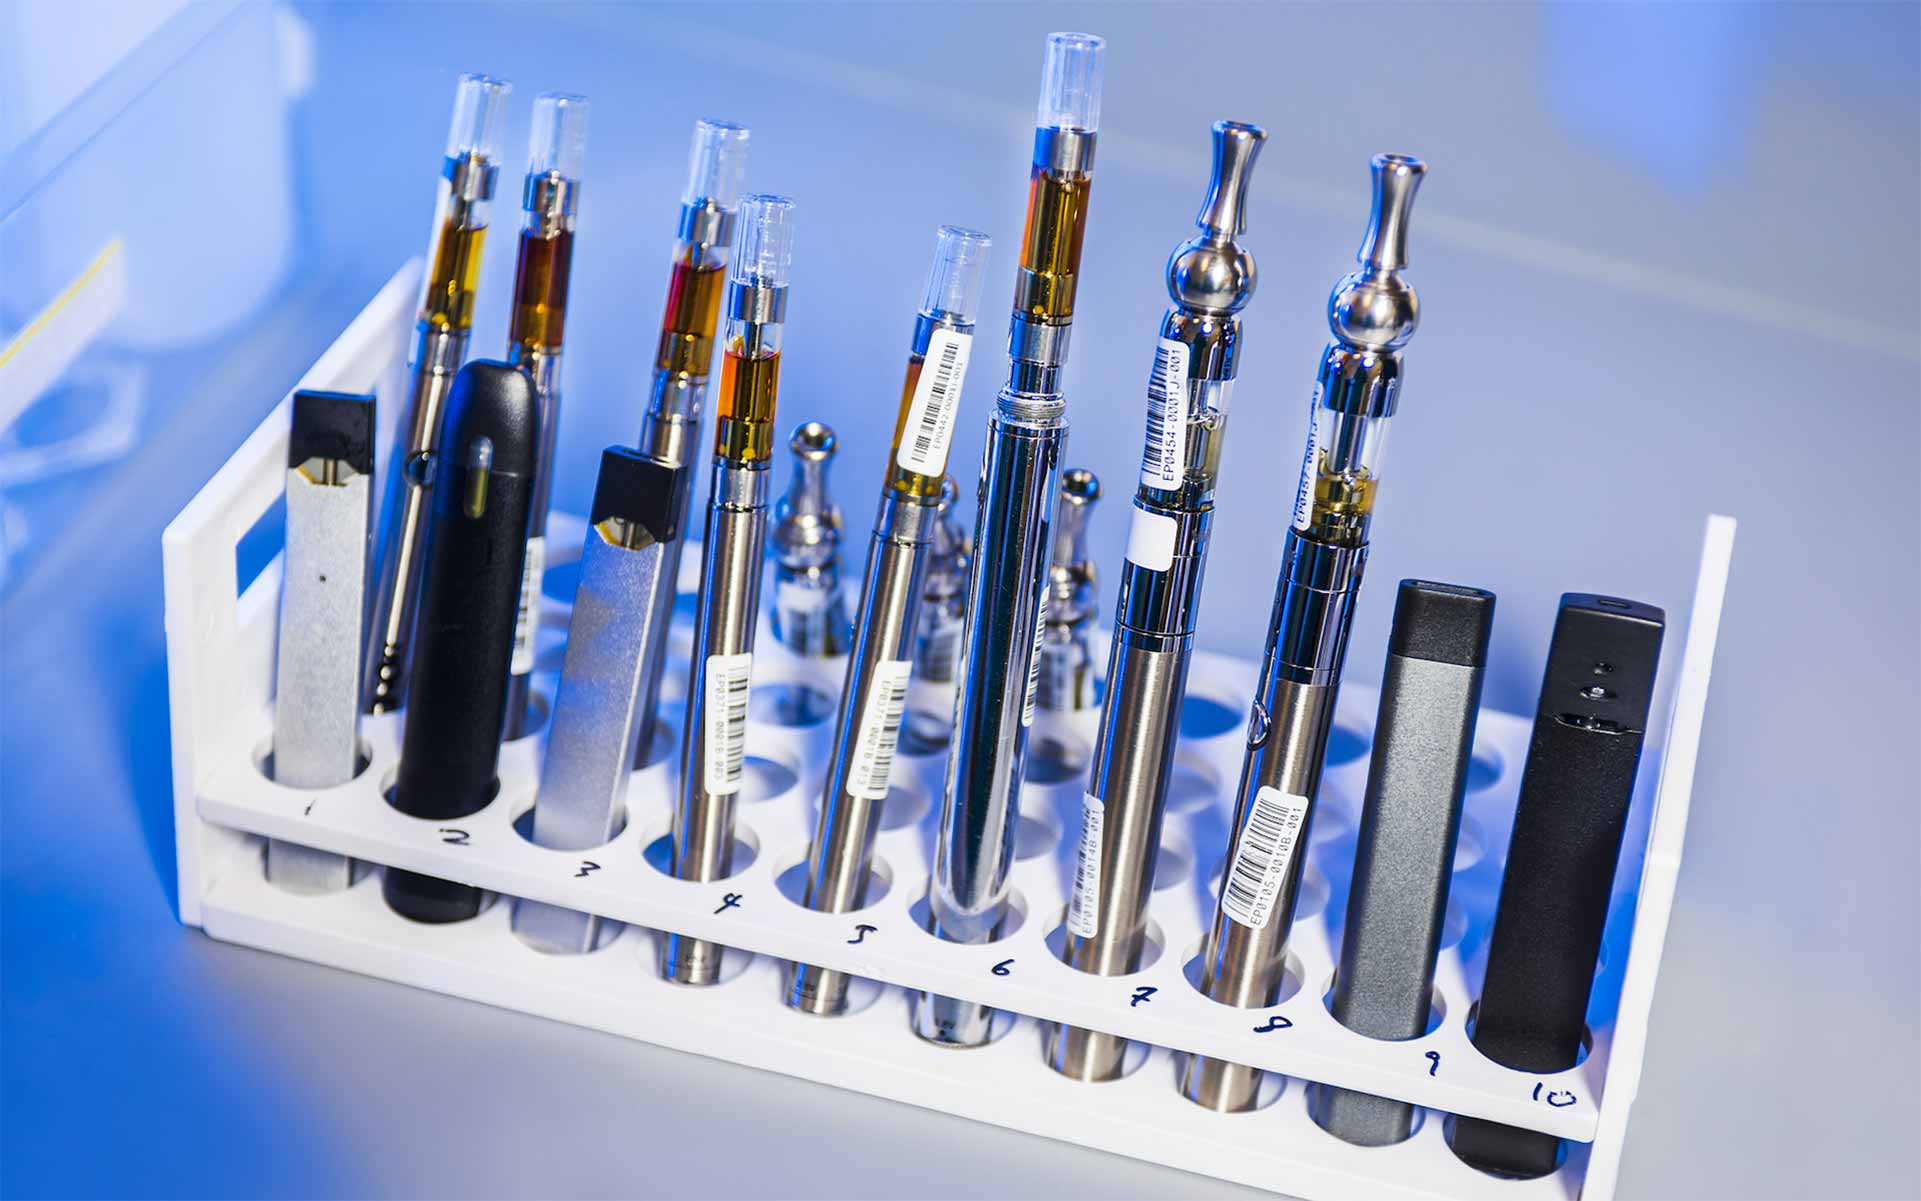 vape lung injury, dangers of vaping cannabis, marijuana vaping illness